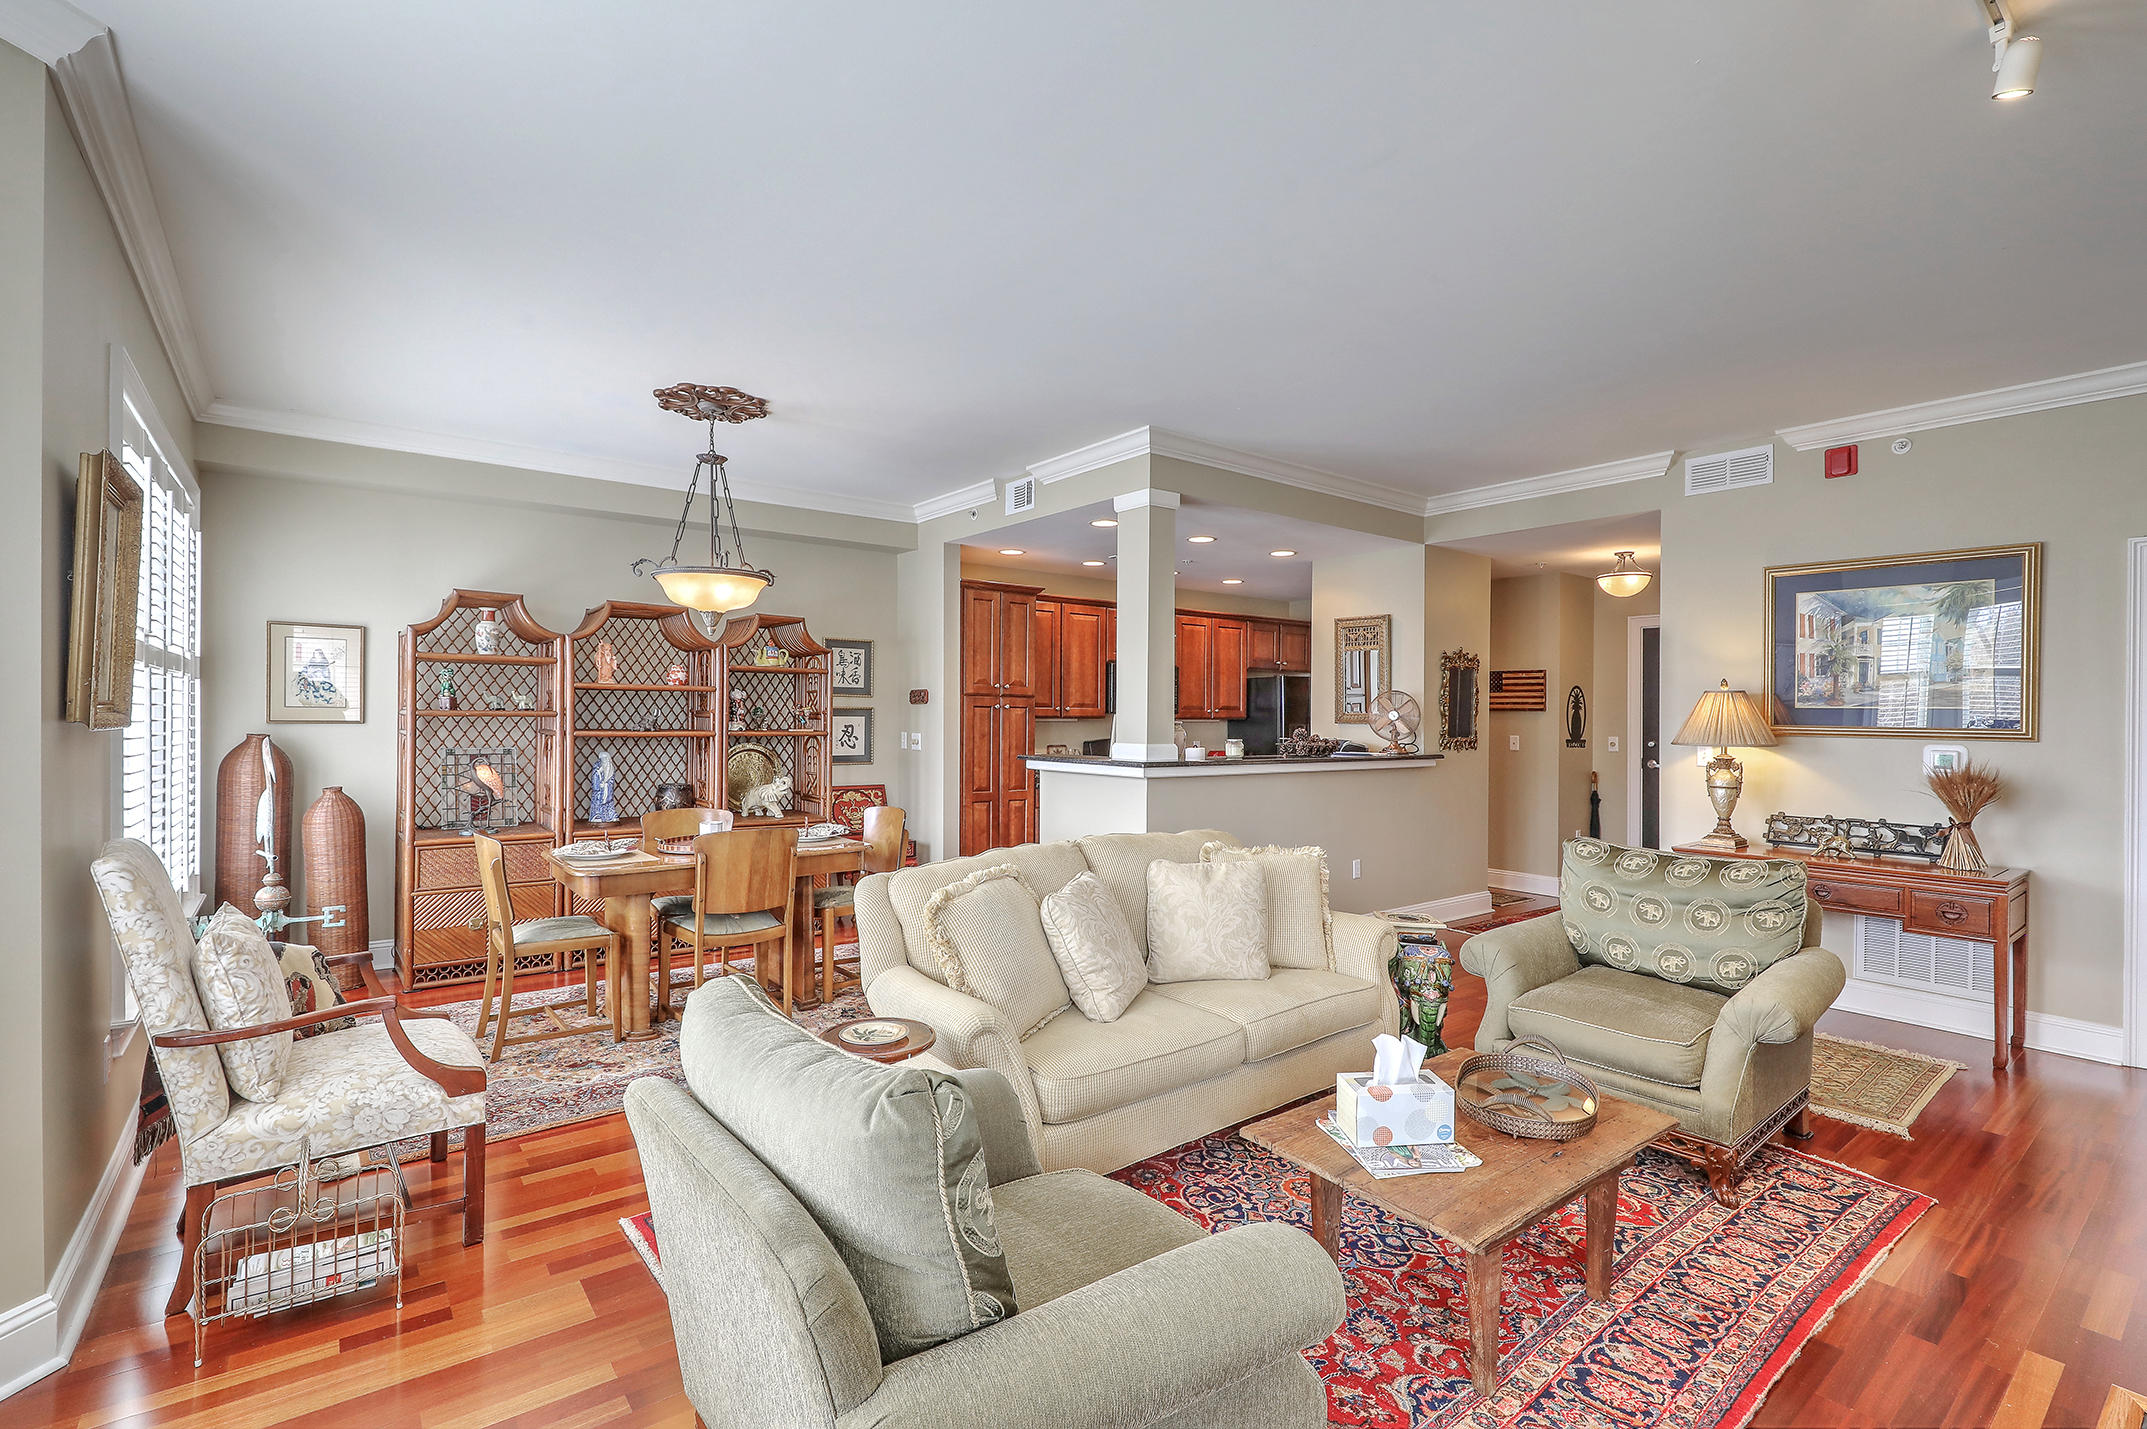 Albemarle Condos For Sale - 498 Albemarle, Charleston, SC - 25